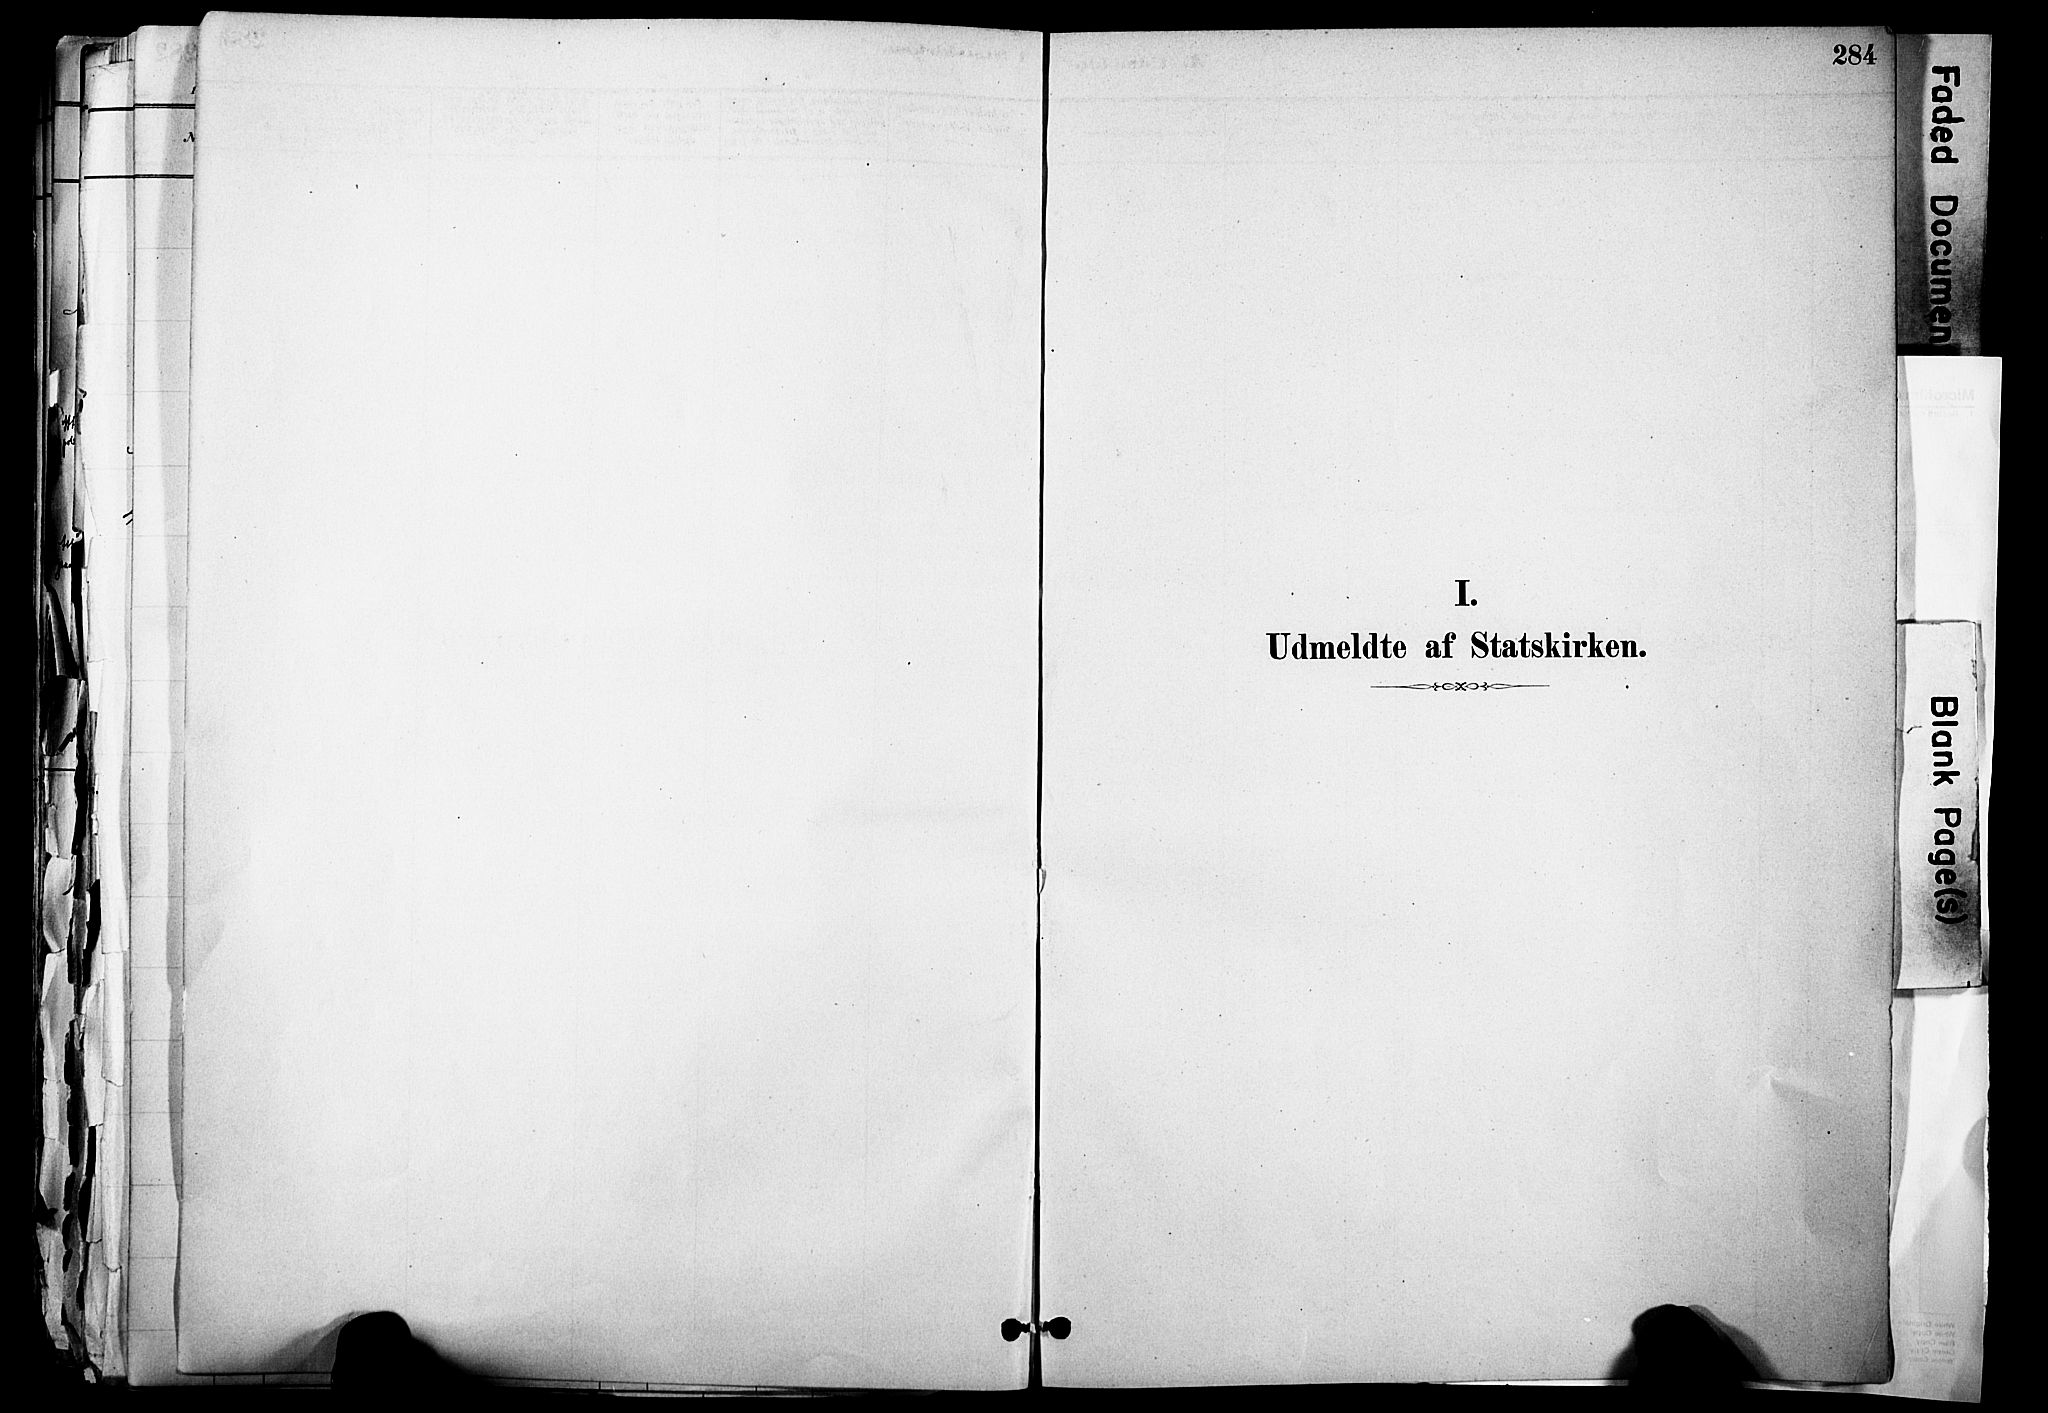 SAH, Skjåk prestekontor, Ministerialbok nr. 3, 1880-1907, s. 284